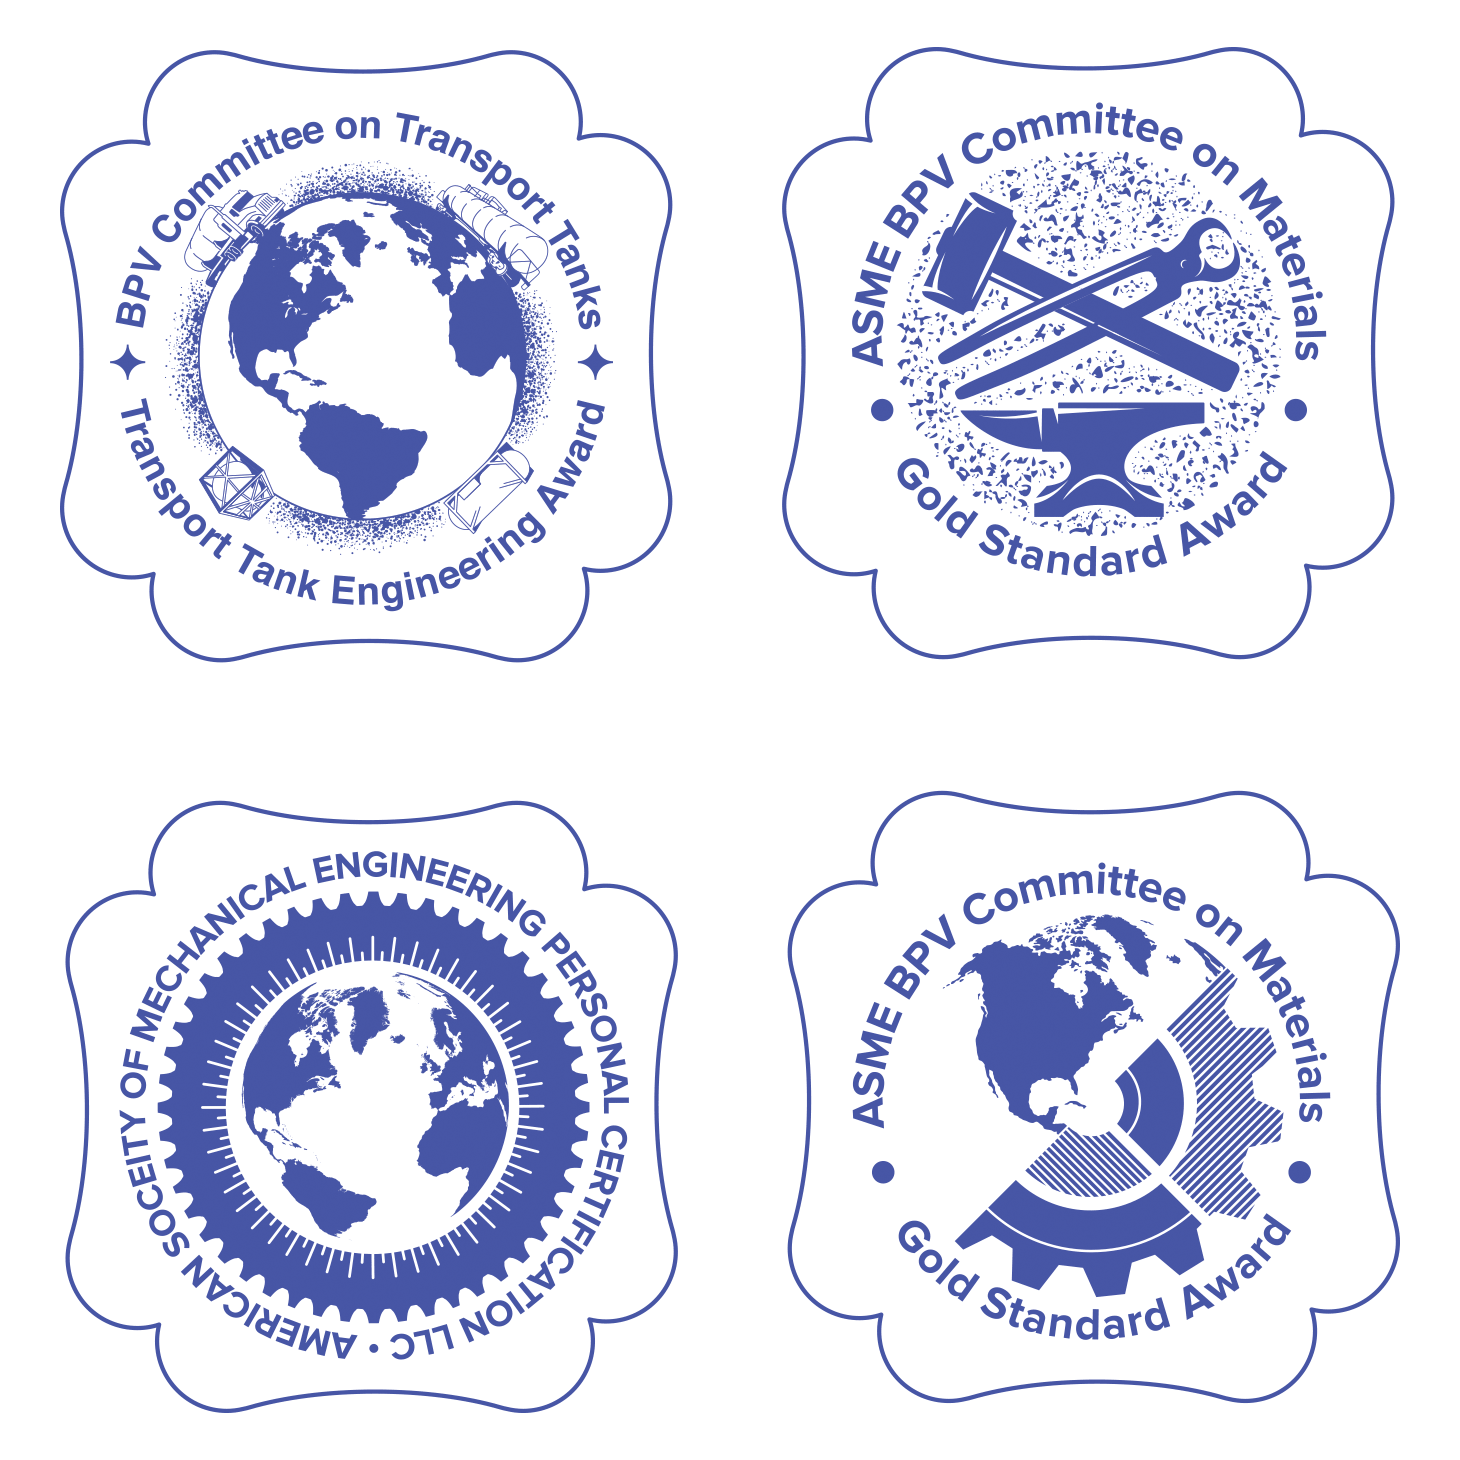 Bronze medal designs